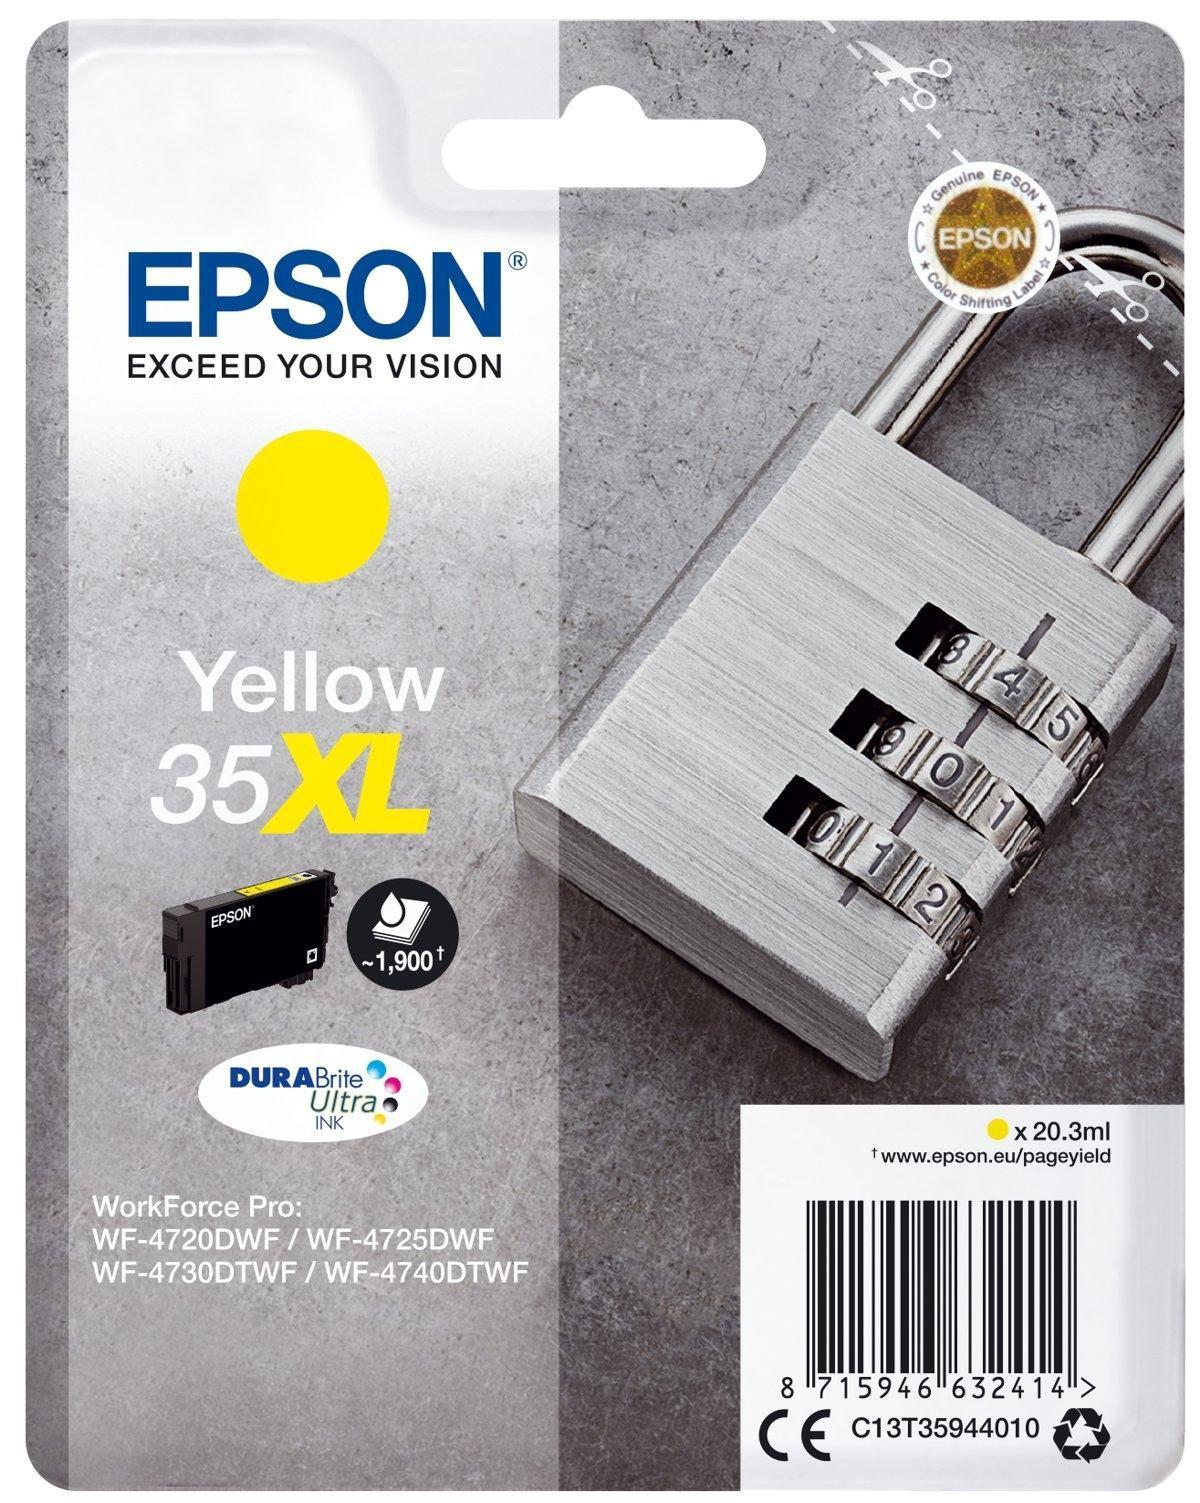 Cartucho de tinta amarillo 35XL DURABRITE ULTRA INK (EMBALAJE INDIVIDUAL 1 X 20 3 ML)